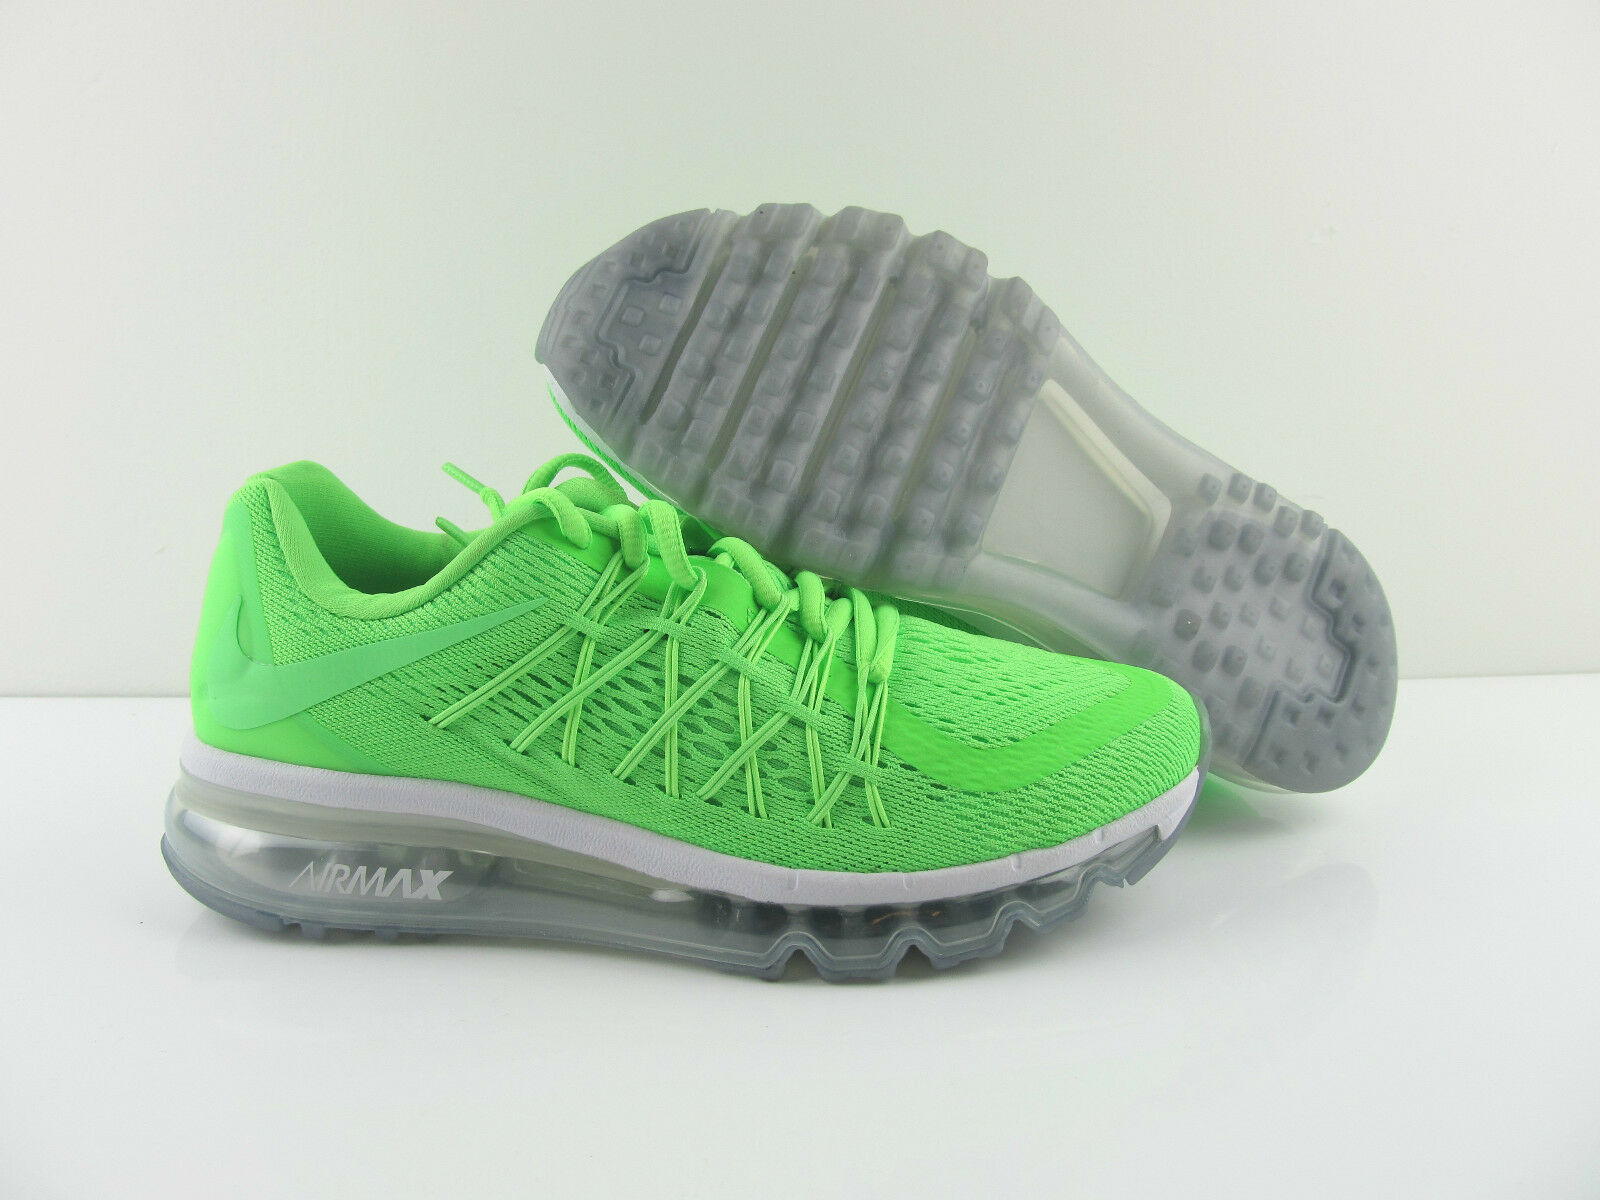 Nike Air Max 2015 Green Voltage Running Sneaker Schuhe New Eur 37.5  38.5